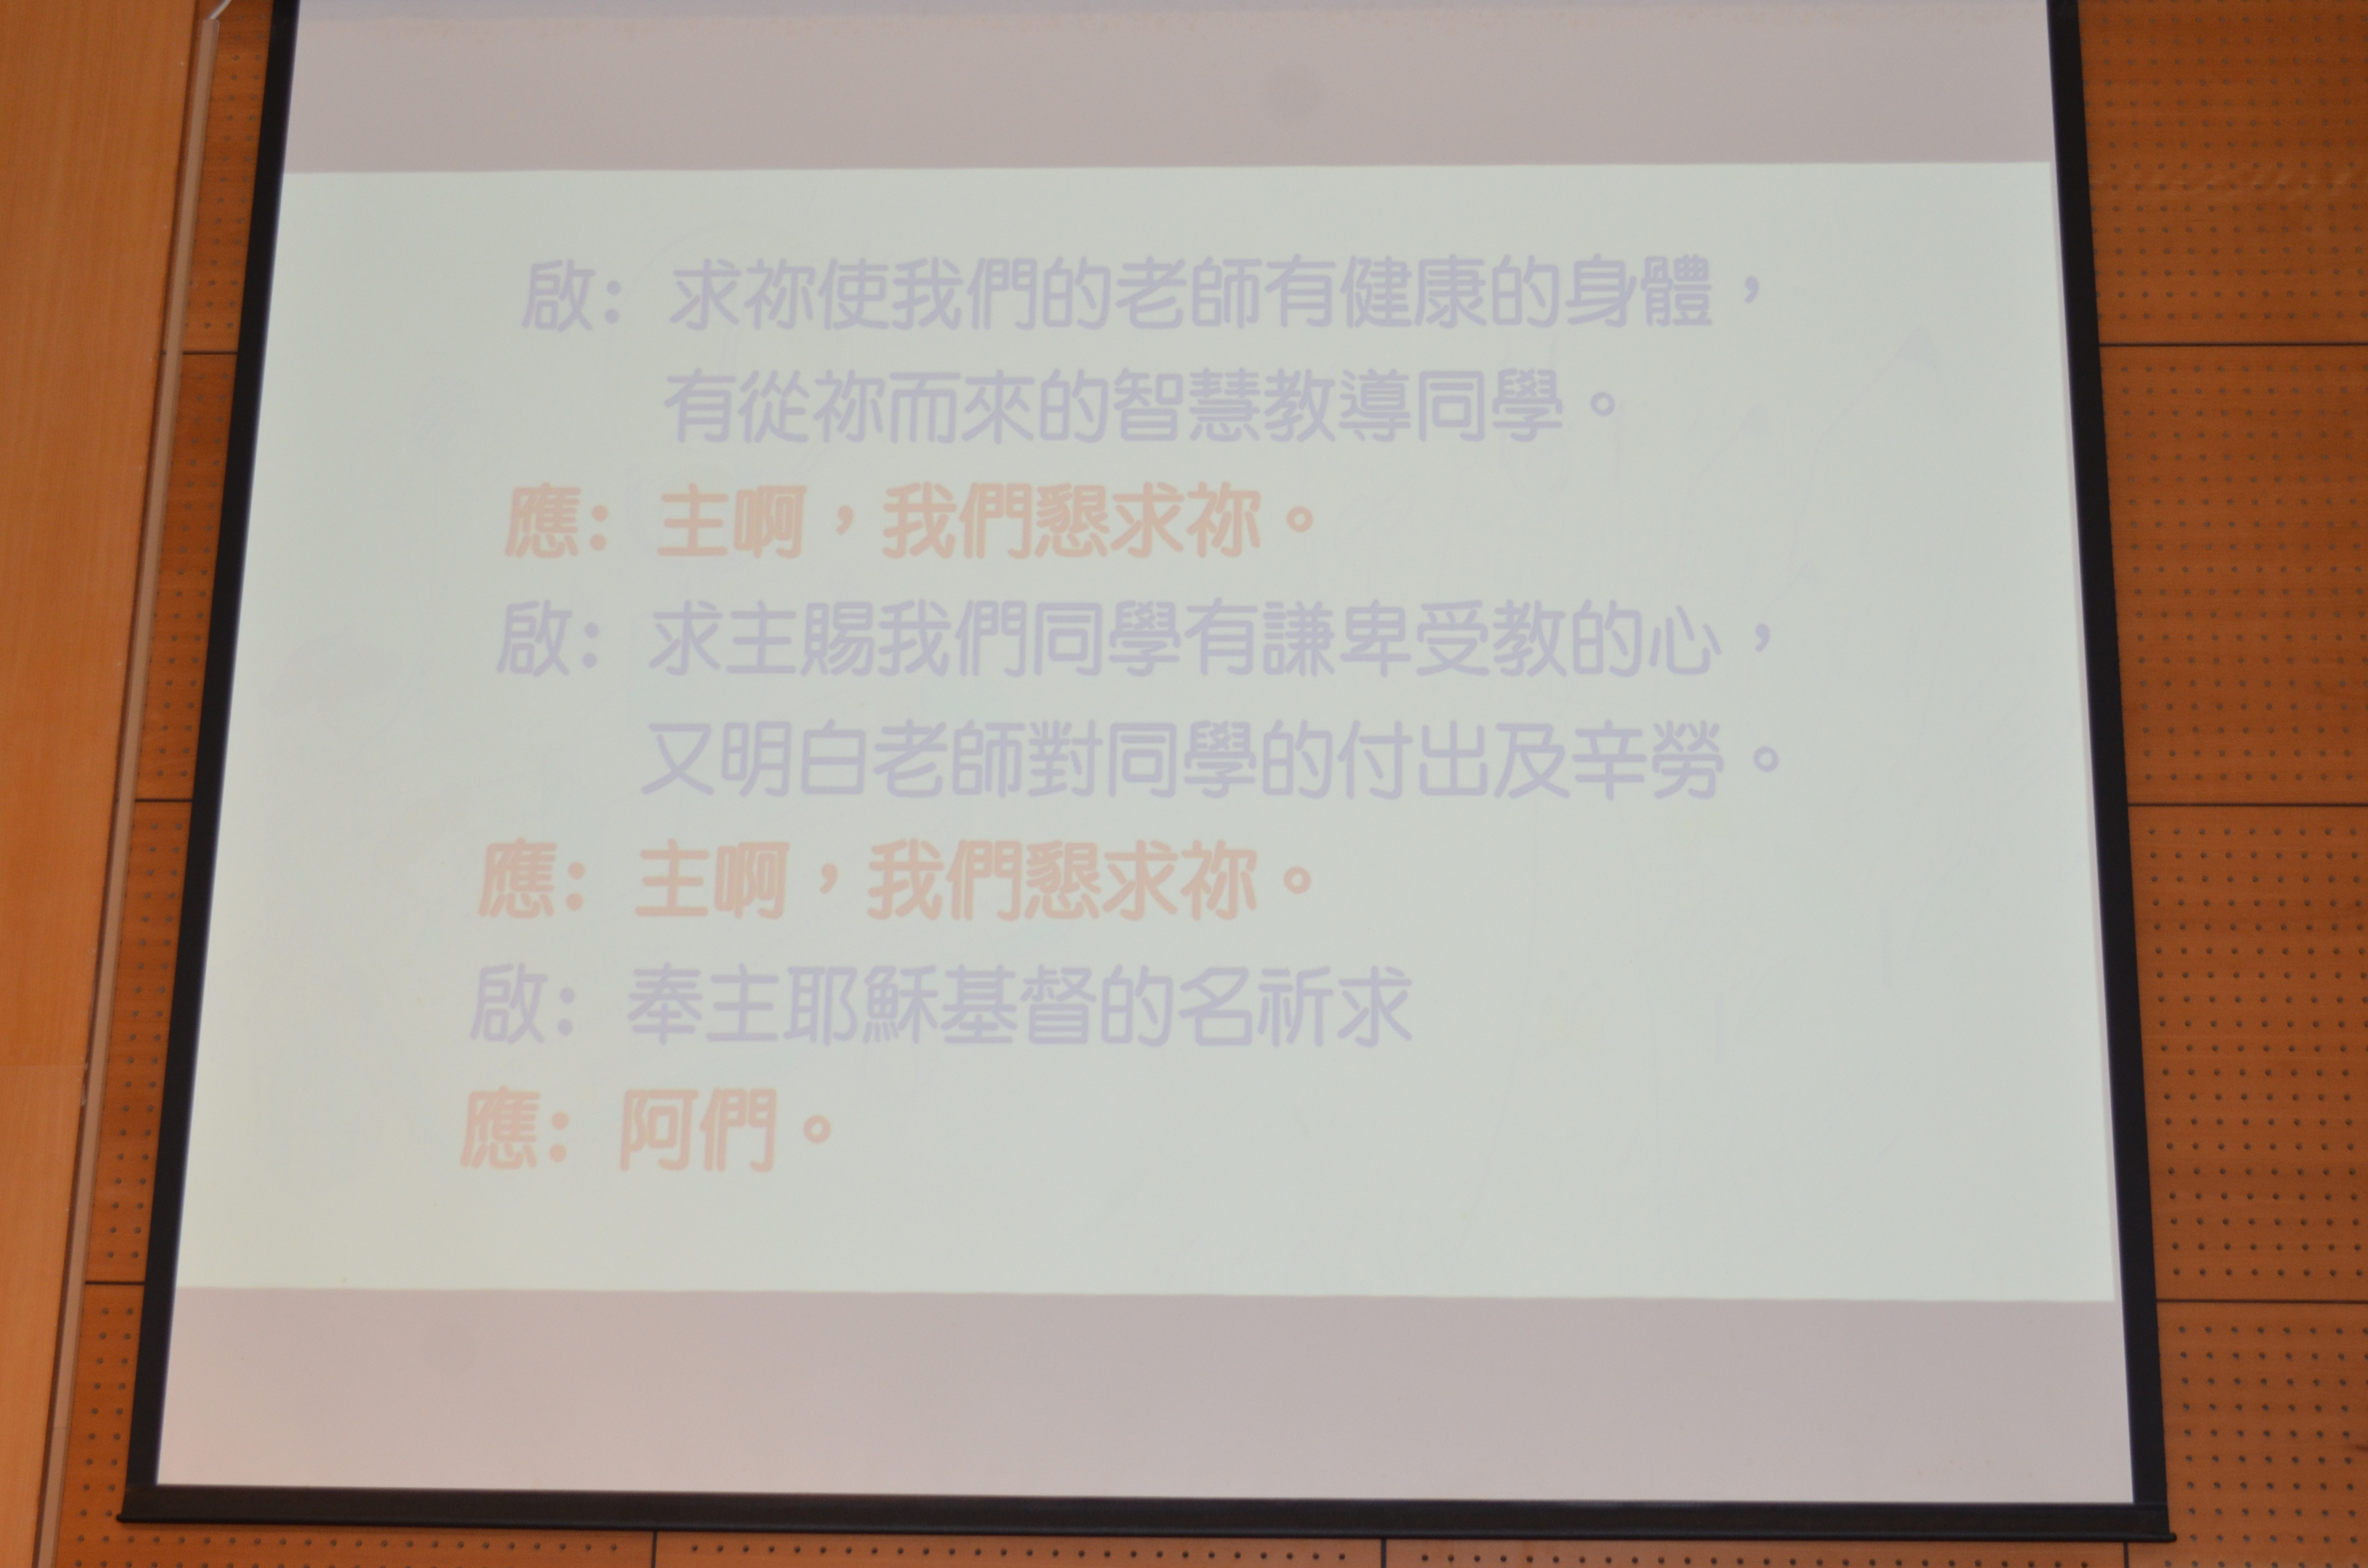 https://skhtswlo.edu.hk/sites/default/files/dsc_3438_1.jpg